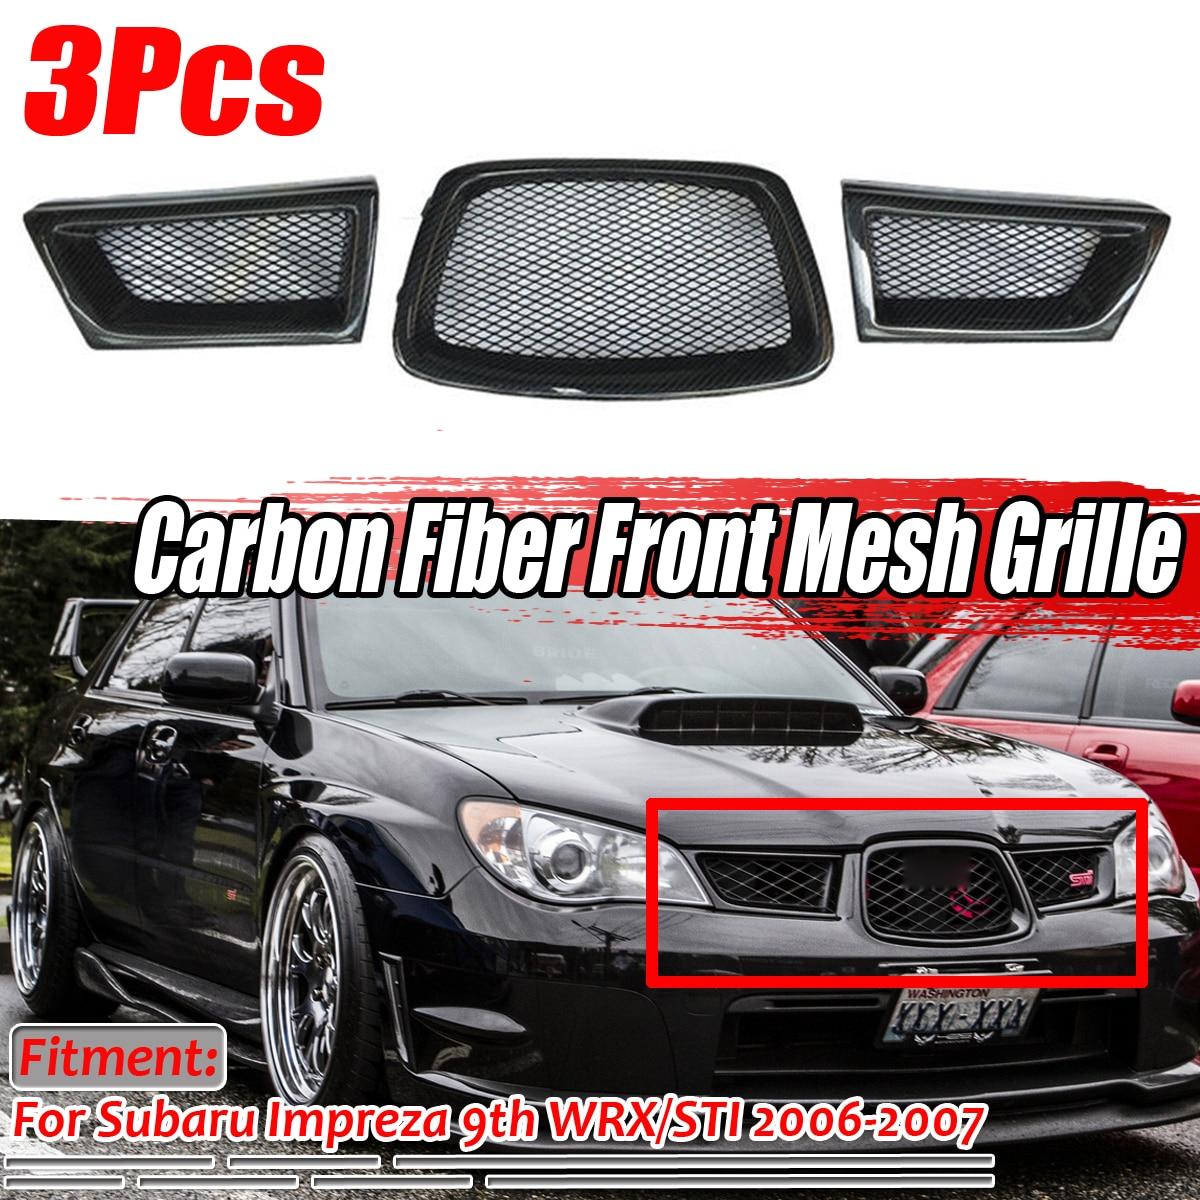 Black 3Pcs Carbon Fiber Car Front Lower Mesh Grill Grille for subaru Impreza WRX STi 9th 2006 2007 28012 Racing Grills     - title=